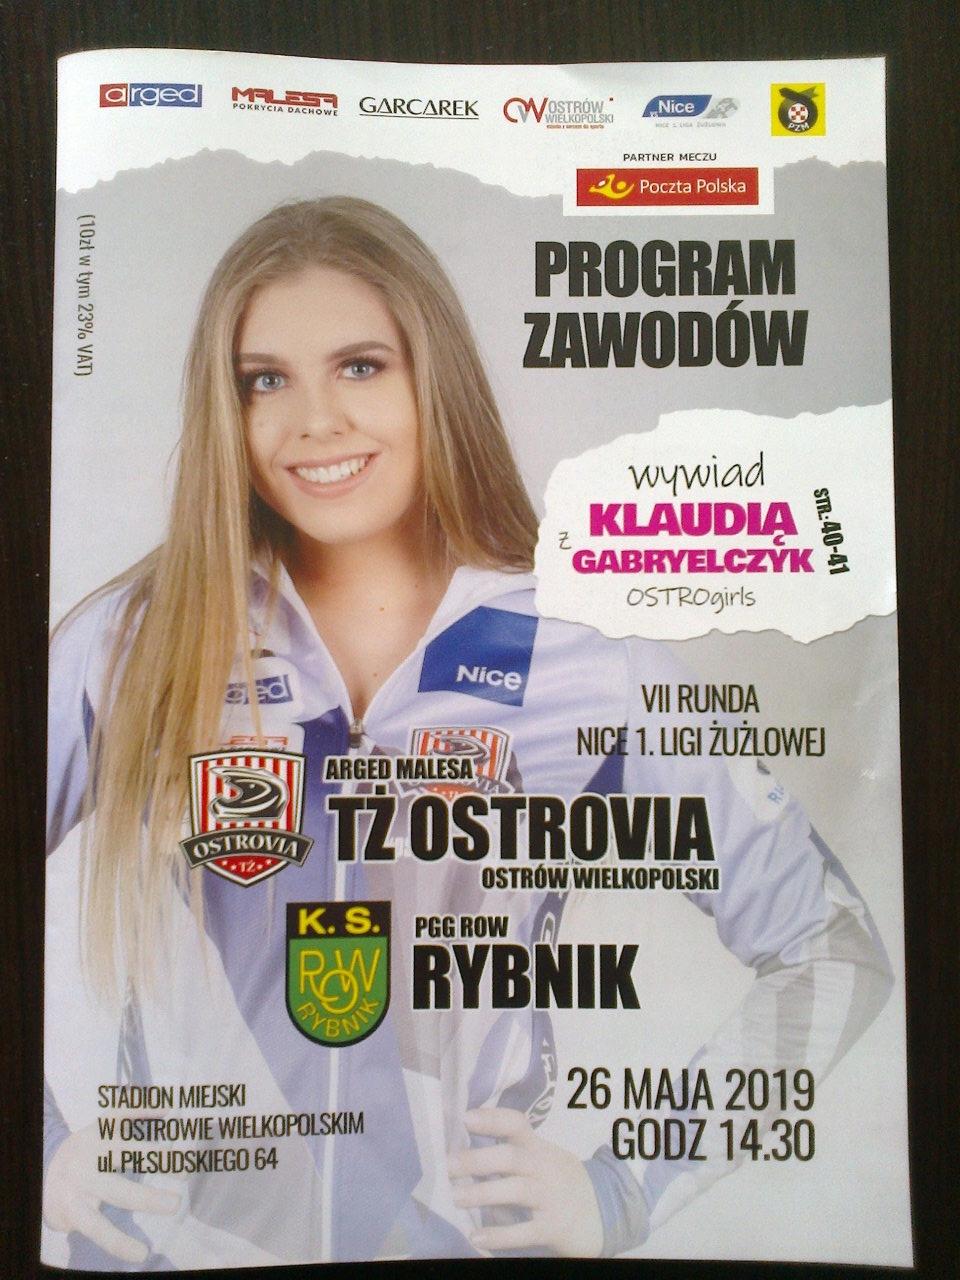 OSTROVIA -ROW RYBNIK 2019